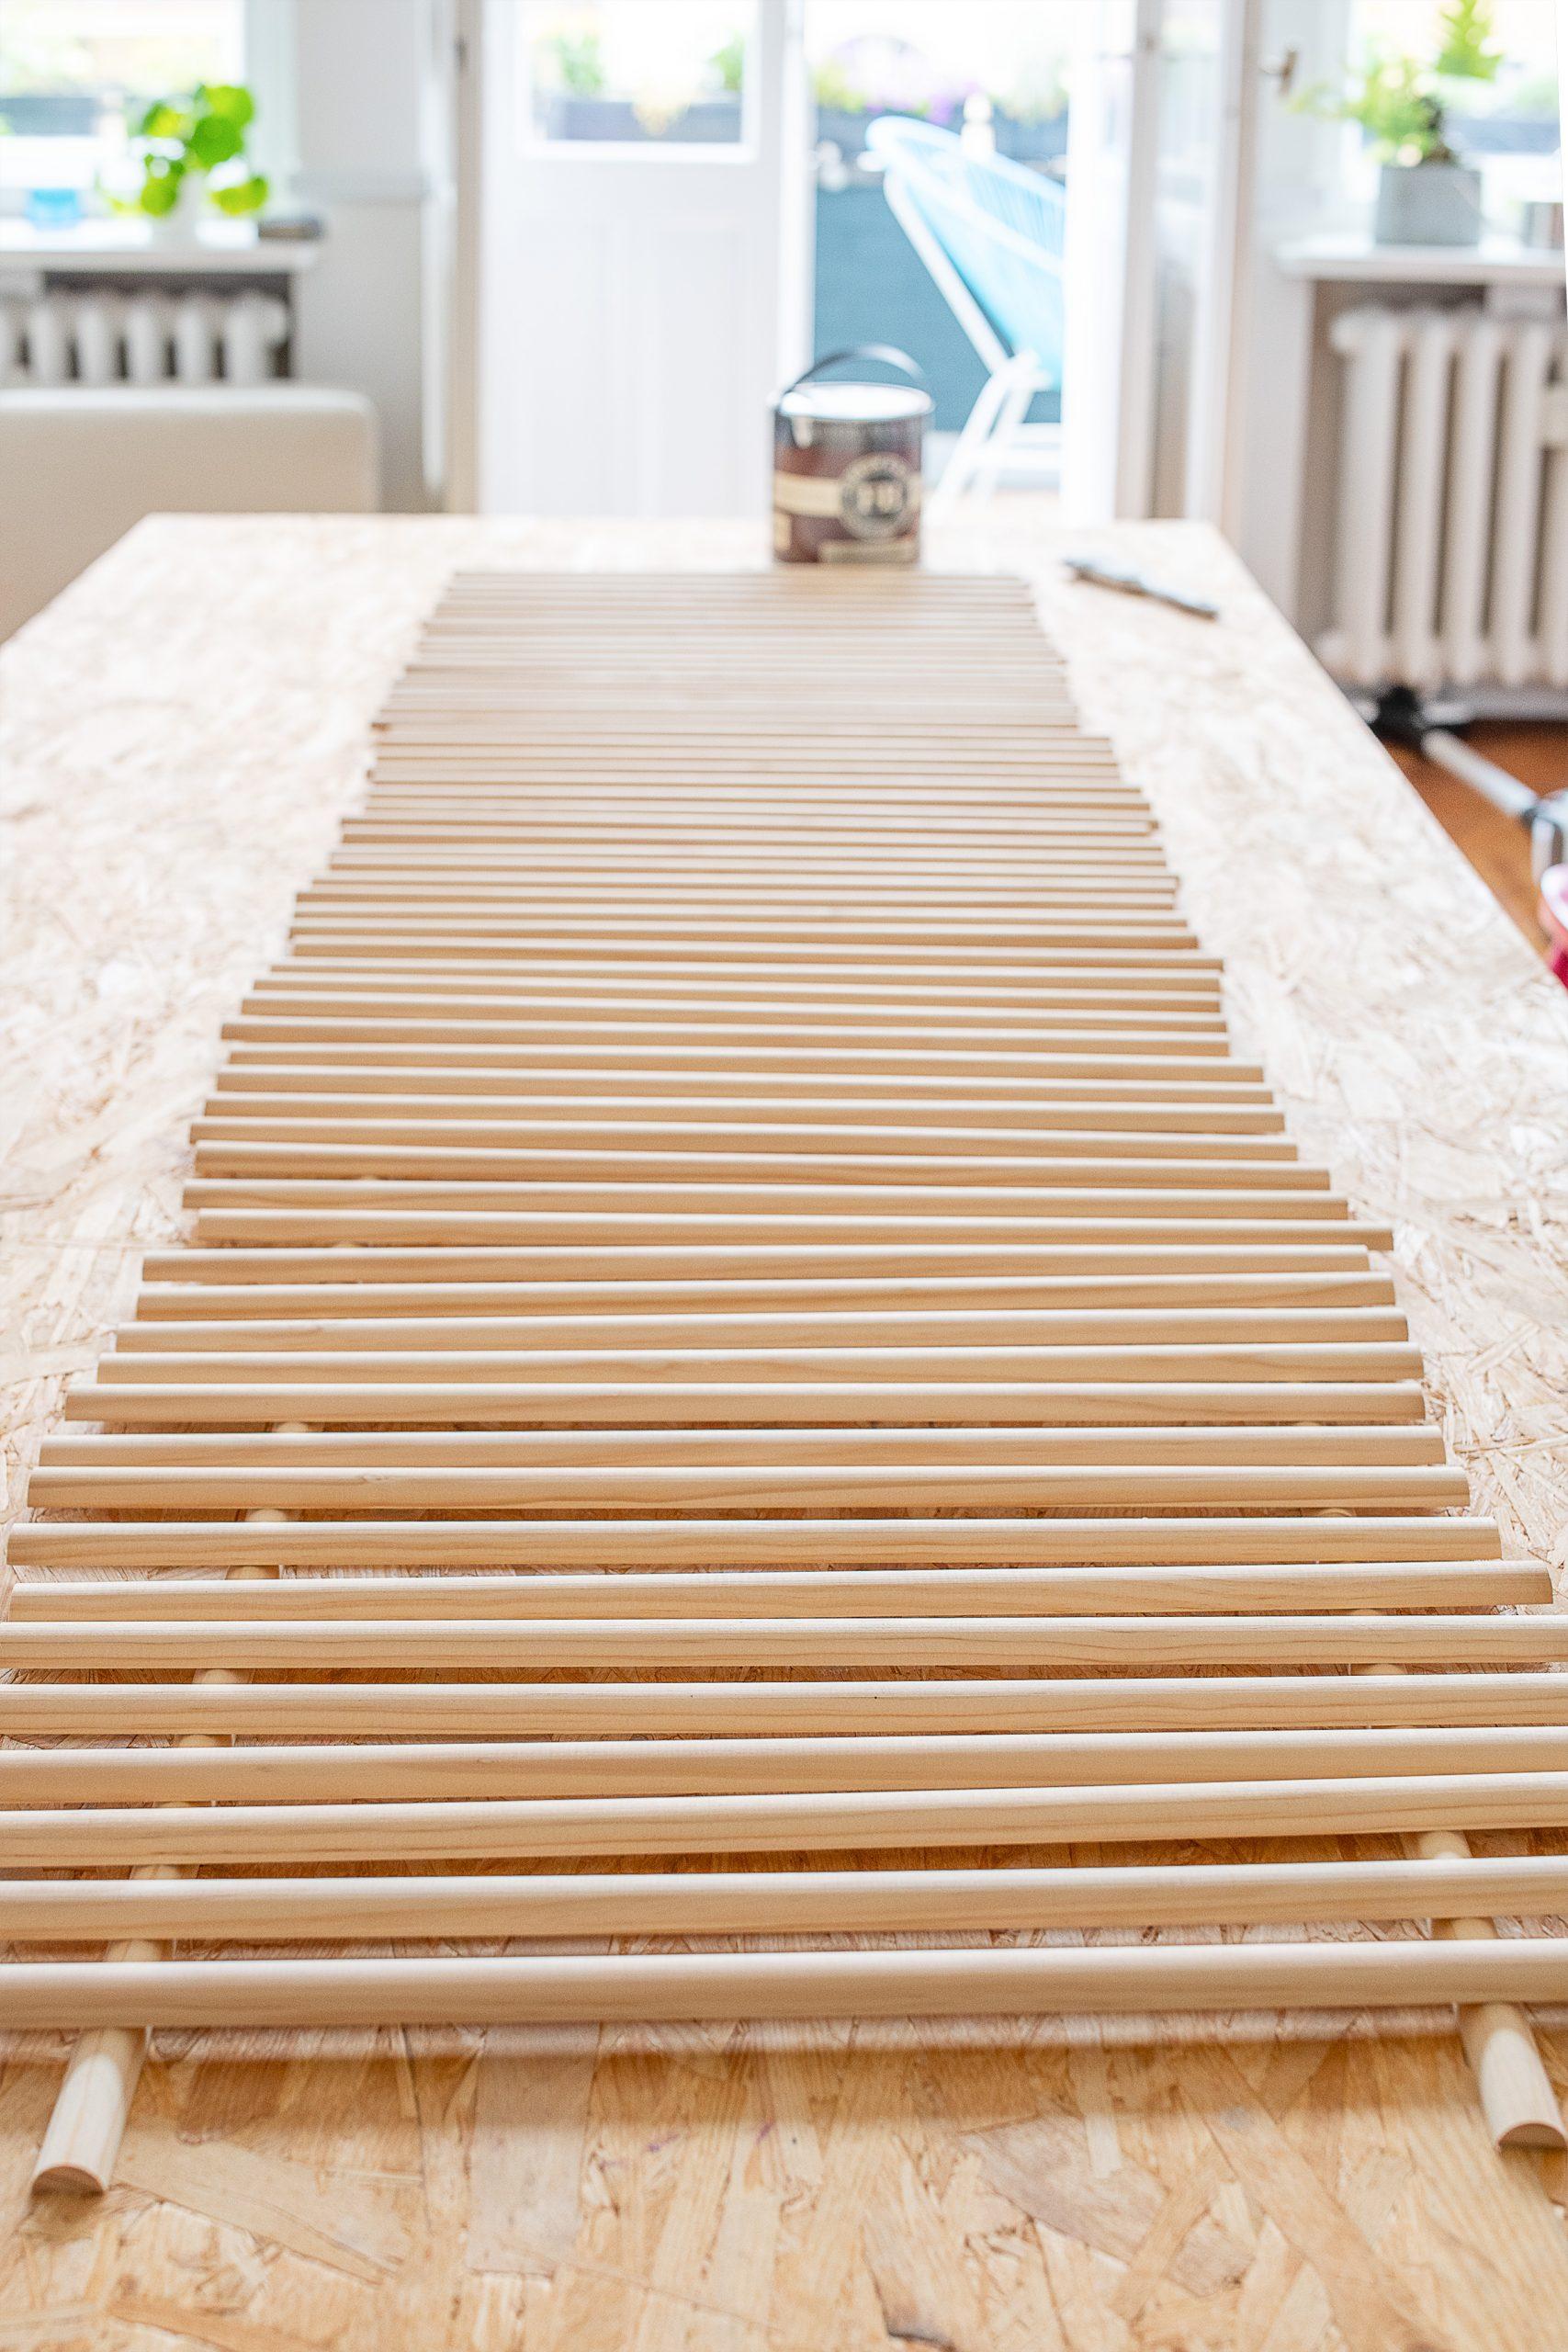 DIY Ribbed Coffee Table - Ribbed Side Slats